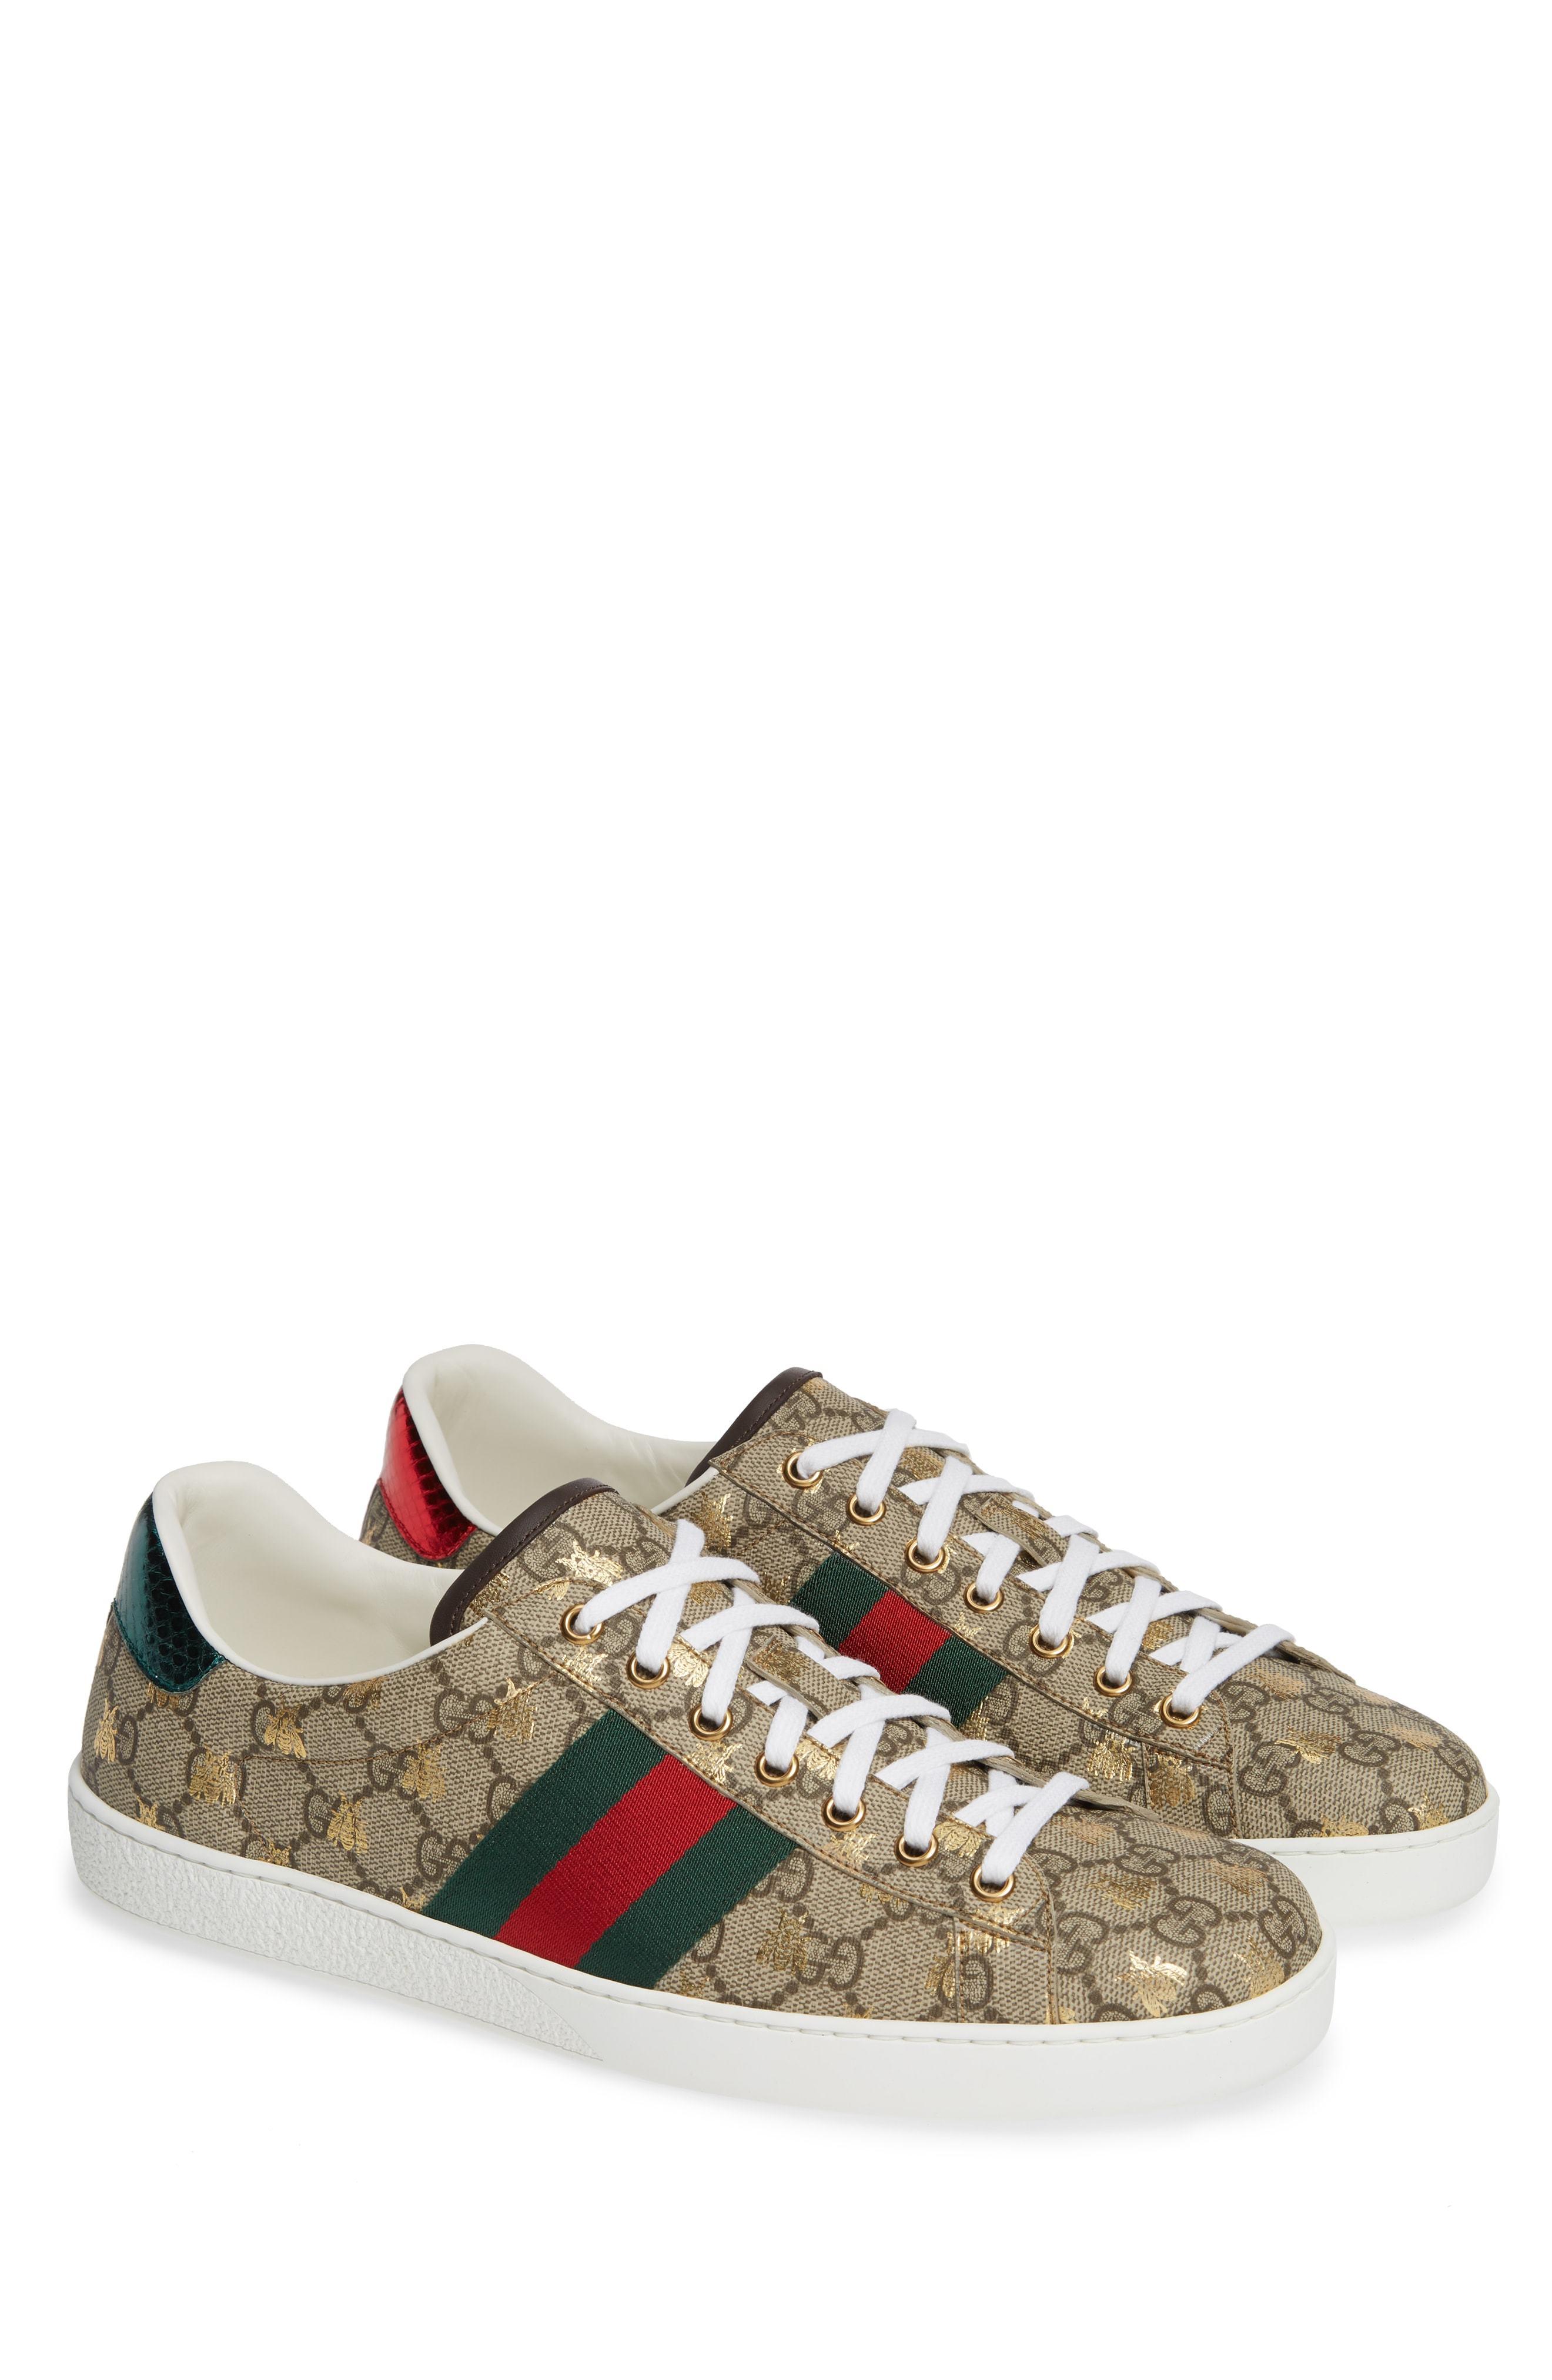 43d564a254 New Ace Gg Supreme Sneaker